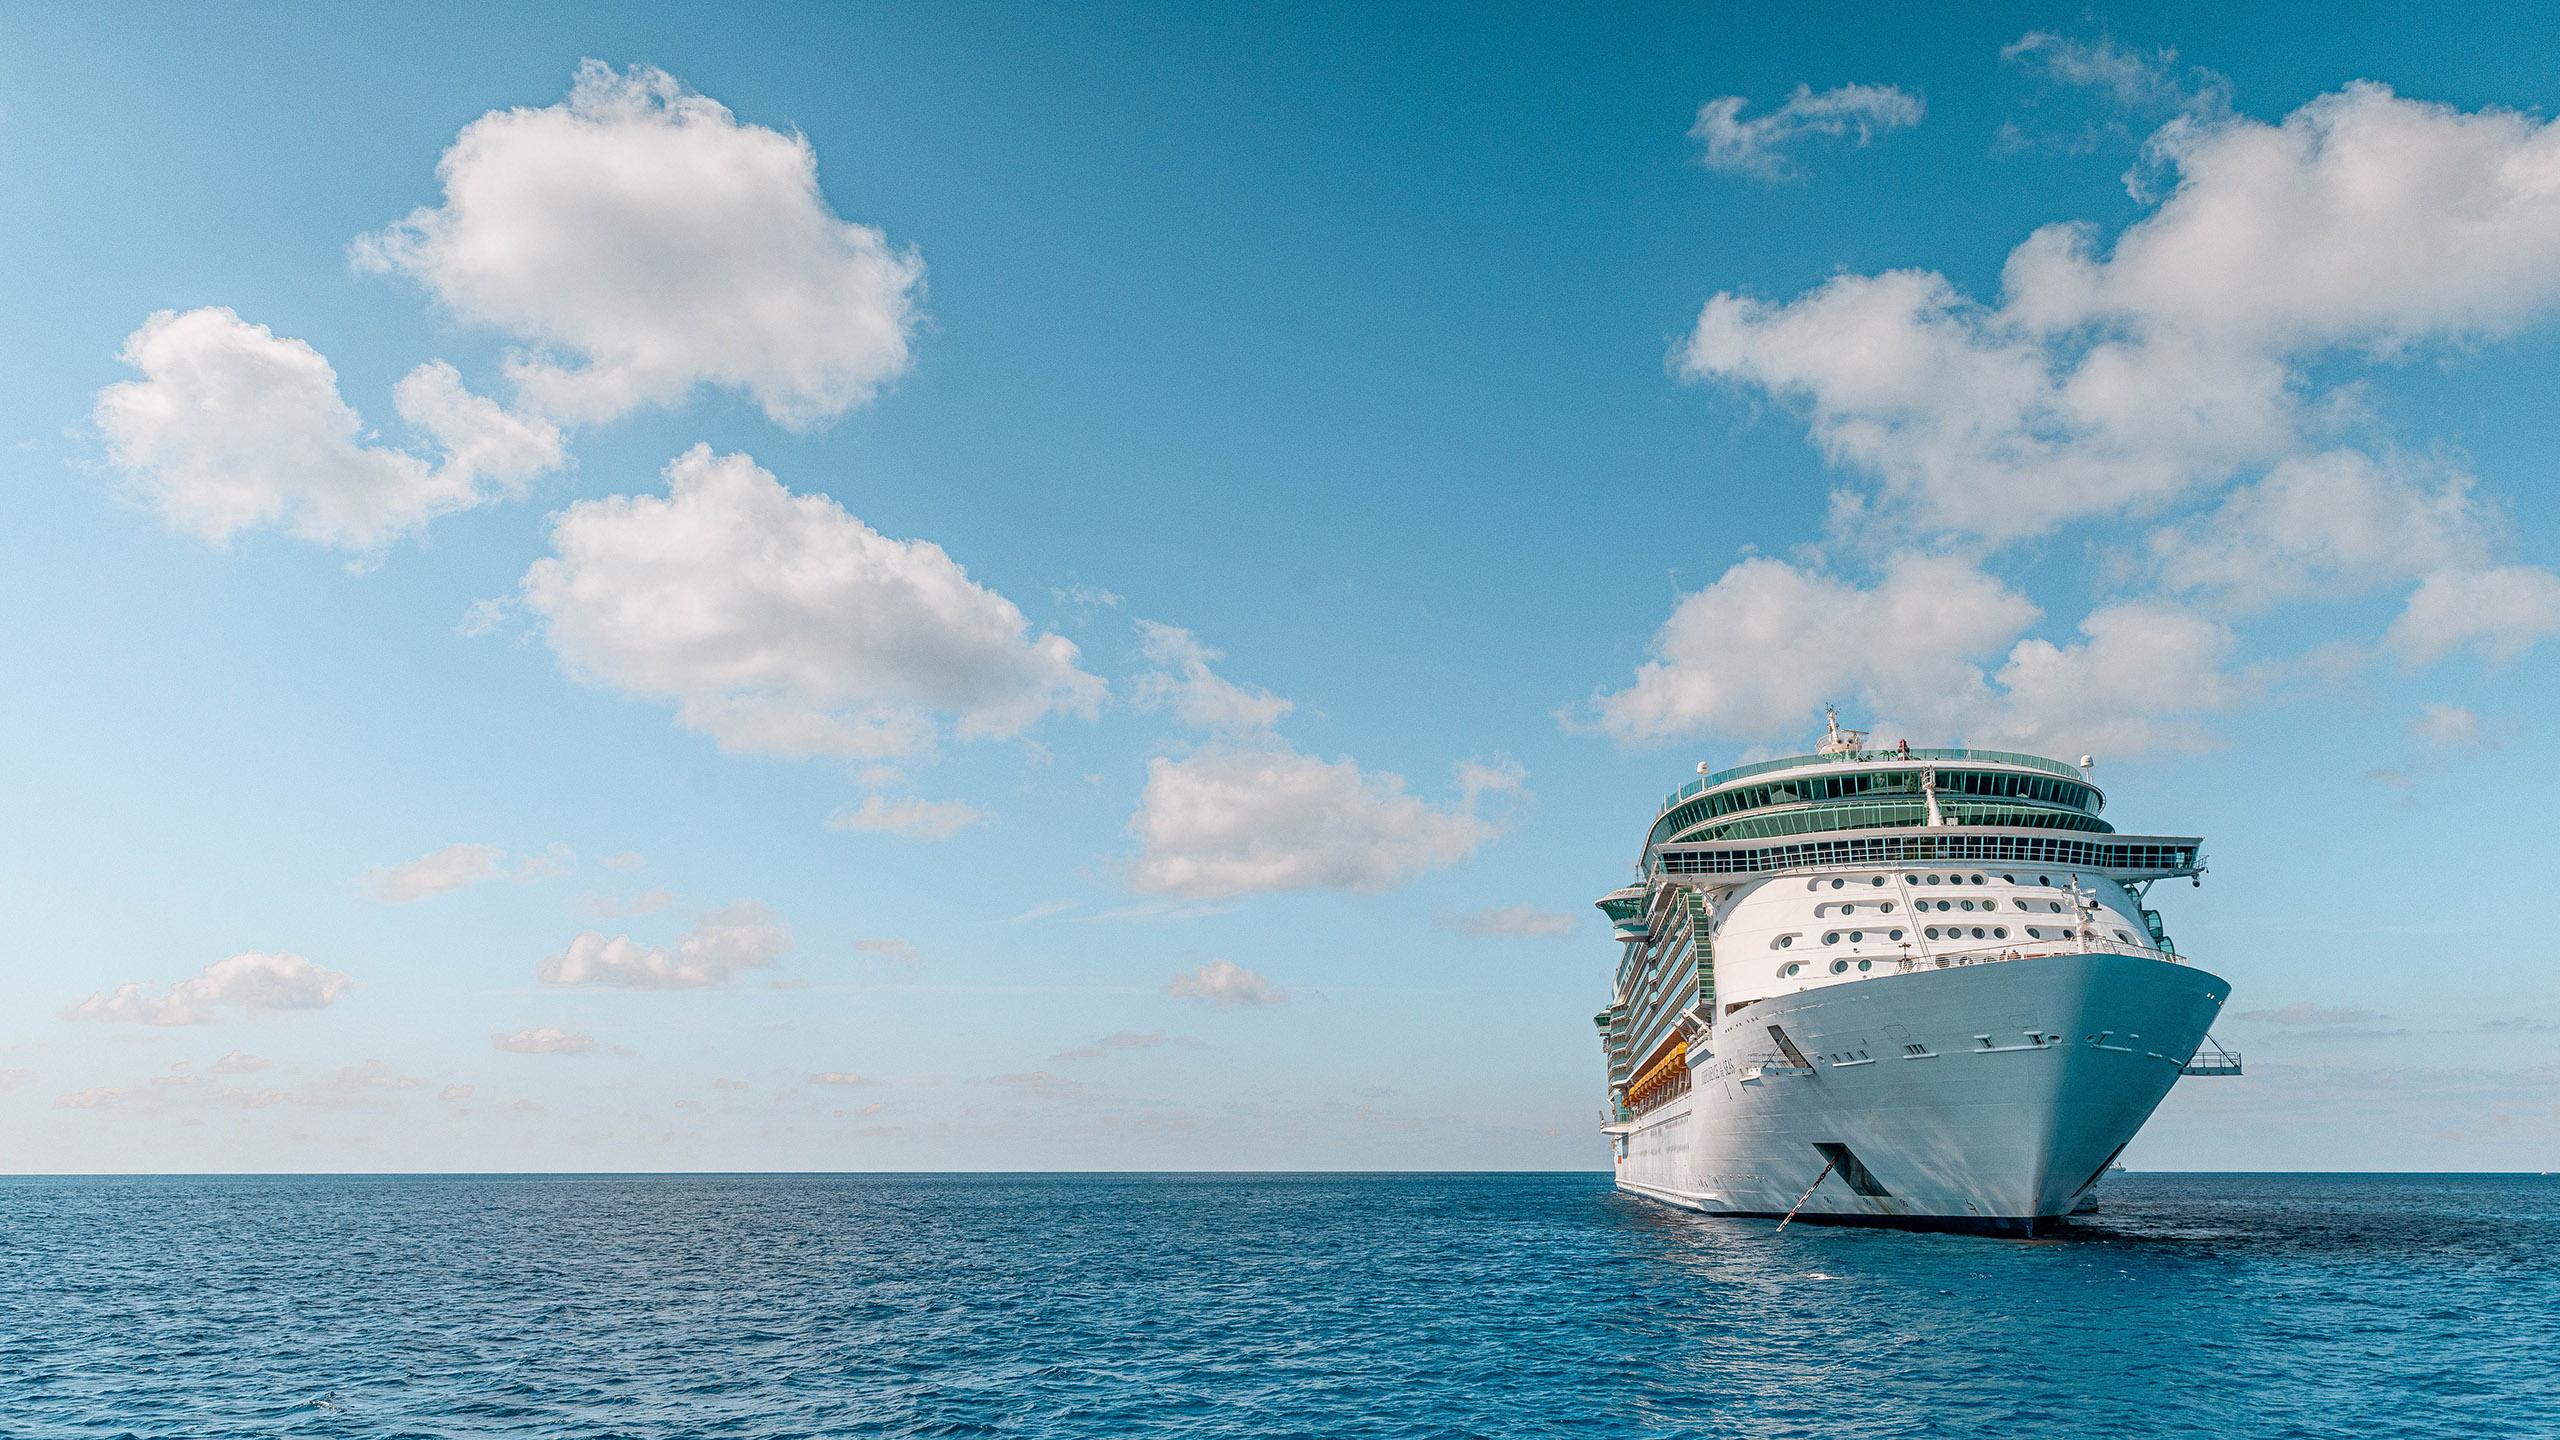 crucero, Carnival, Royal Caribbean, viaje en crucero